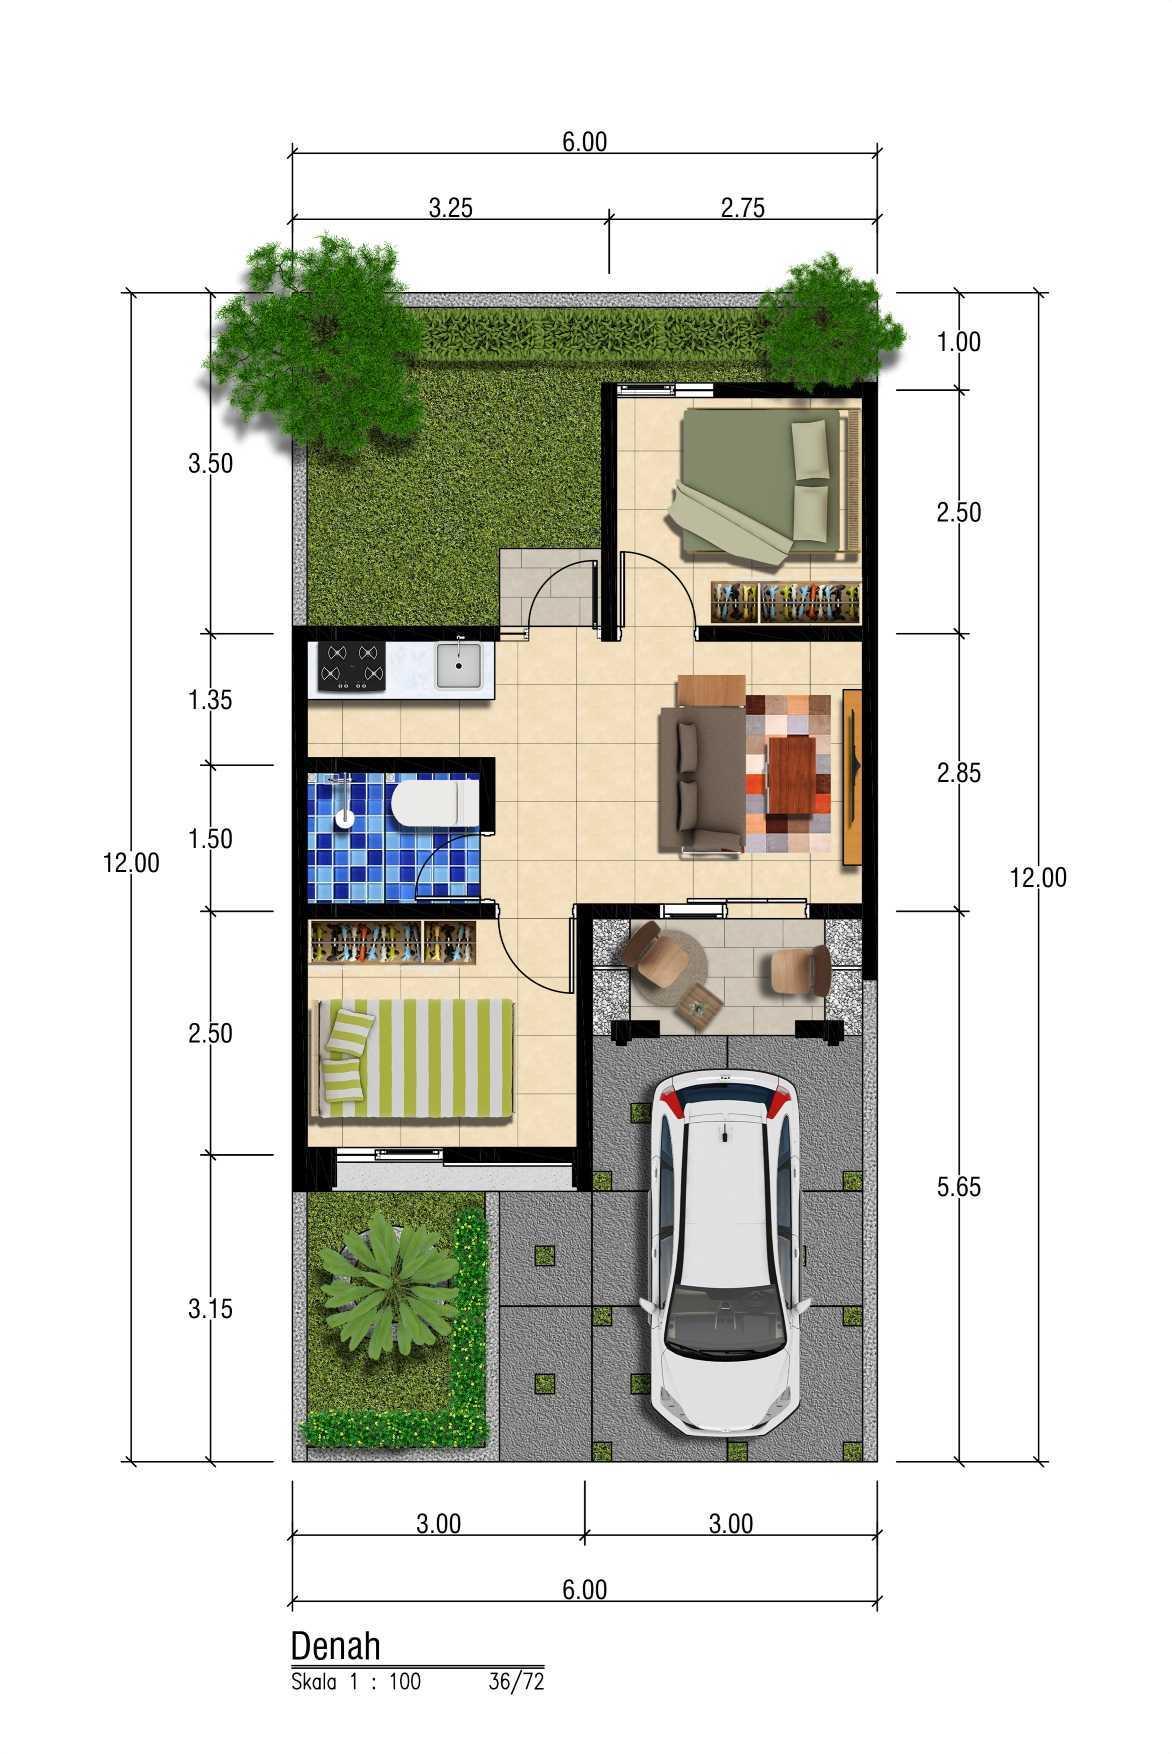 Satuvista Architect D'ahsana Green Residence  Bogor, Jawa Barat, Indonesia Bogor, Jawa Barat, Indonesia Satuvista-Architect-Dahsana-Green-Residence- Modern Denah T 36 59479